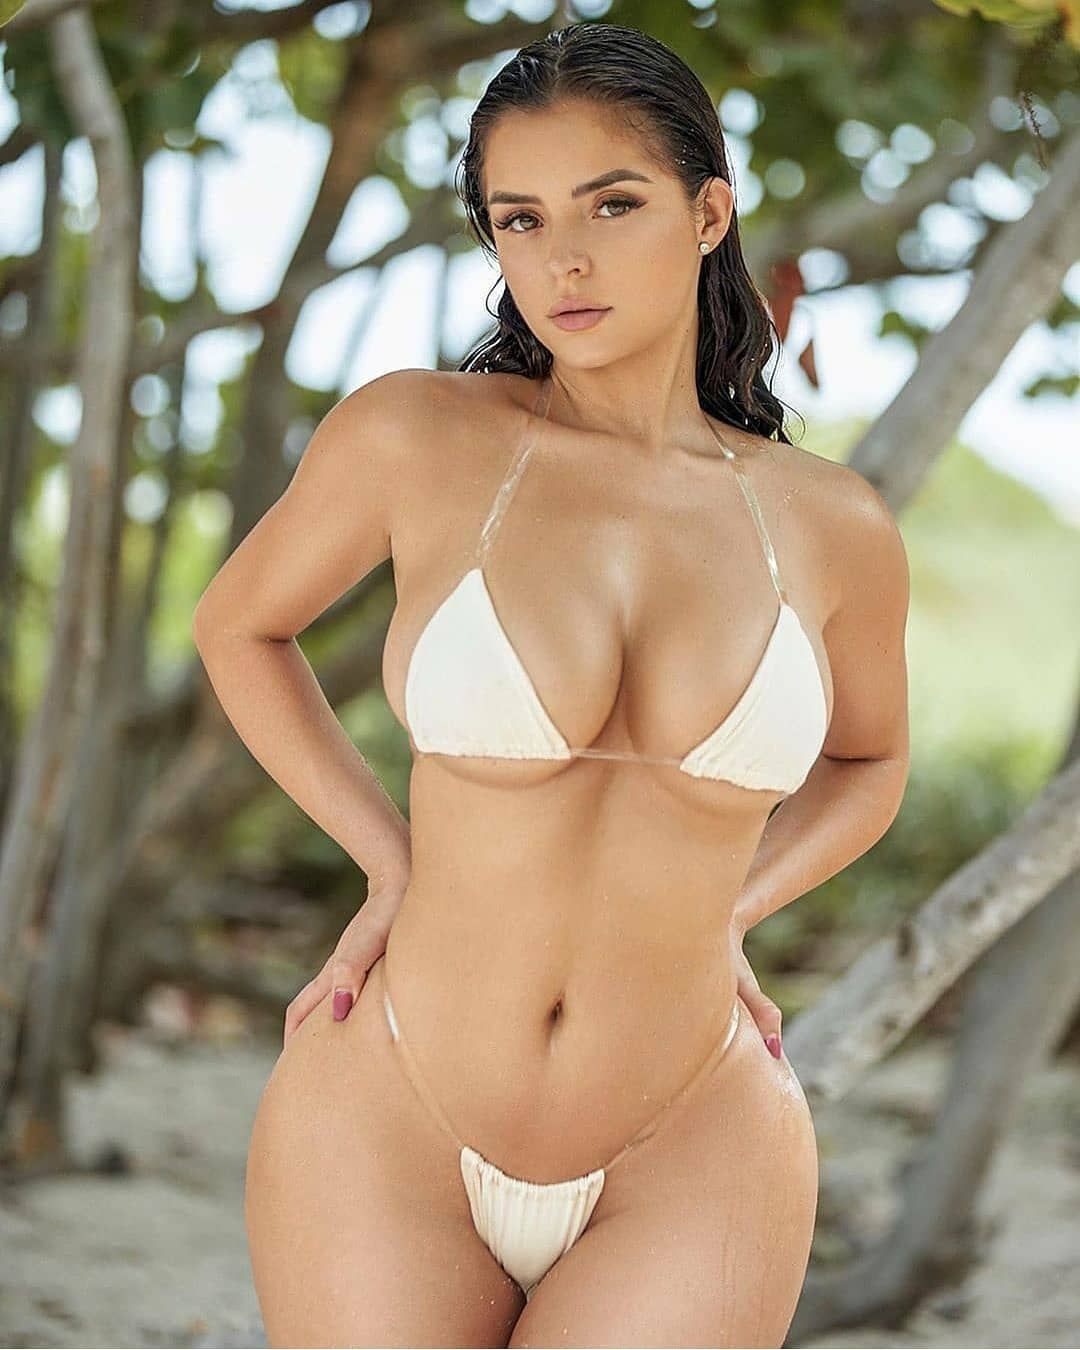 Sexy Model Photo